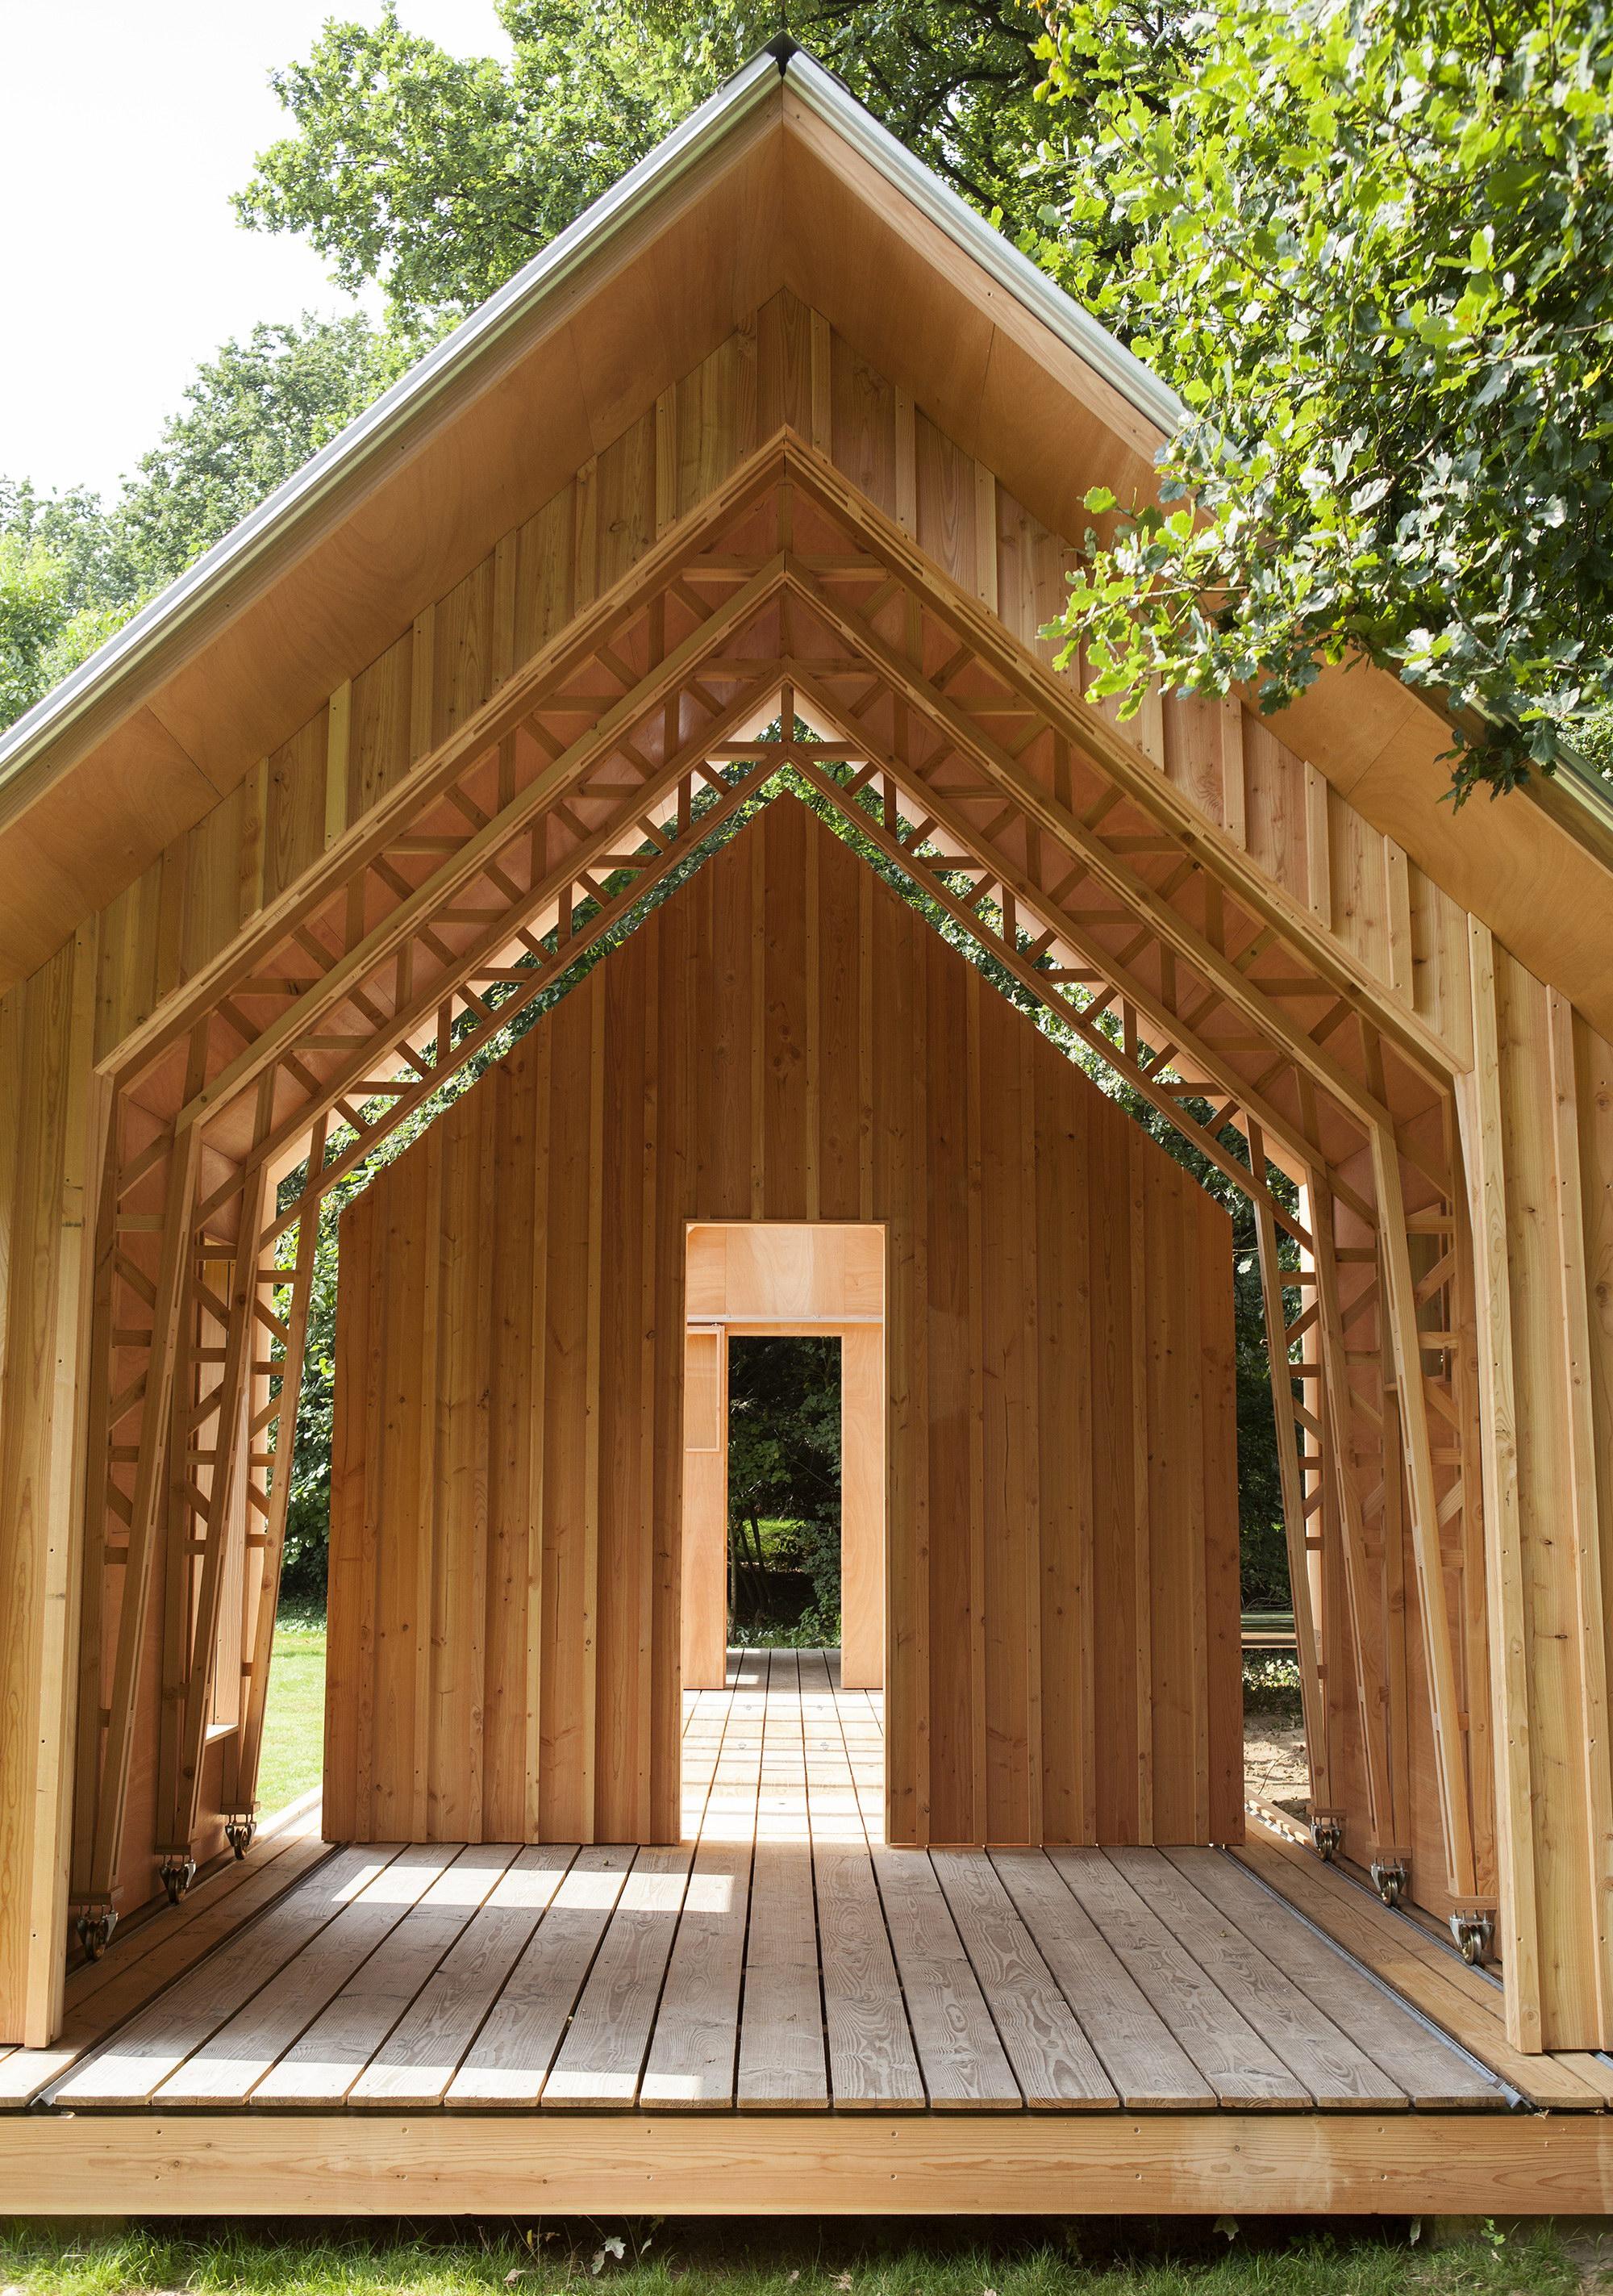 Dynamic Garden House by Caspar Schols